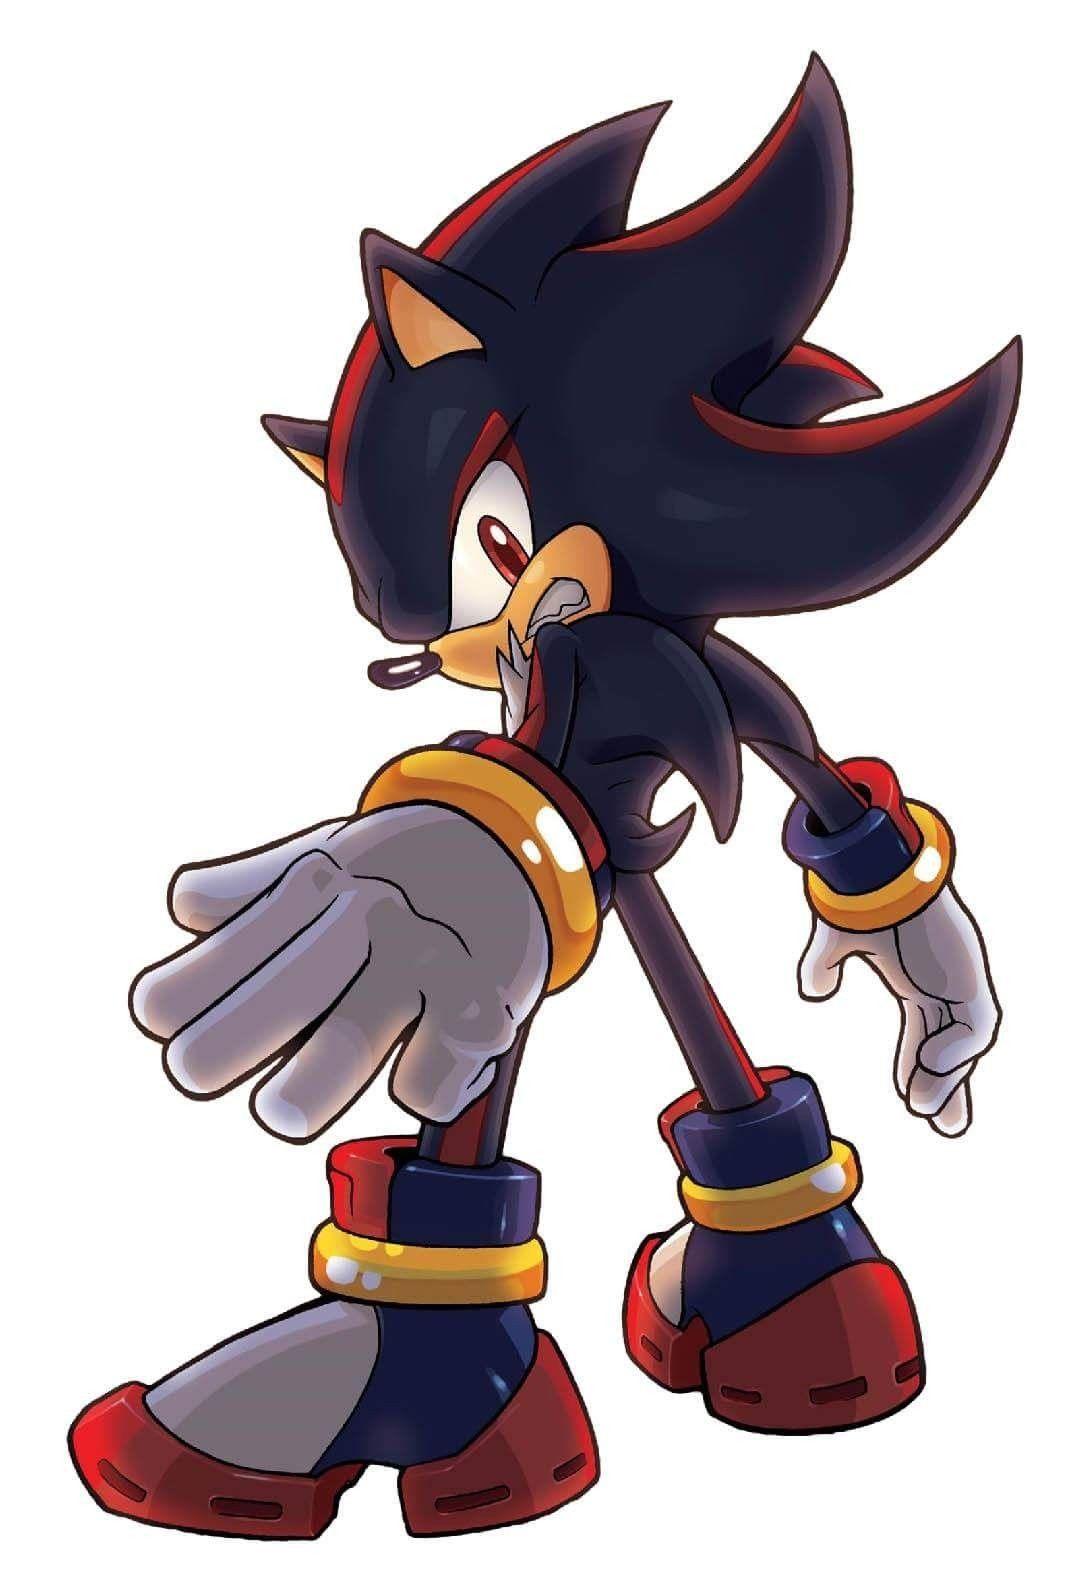 1084x1579 sonic shadow the hedgehog, sonic, shadow